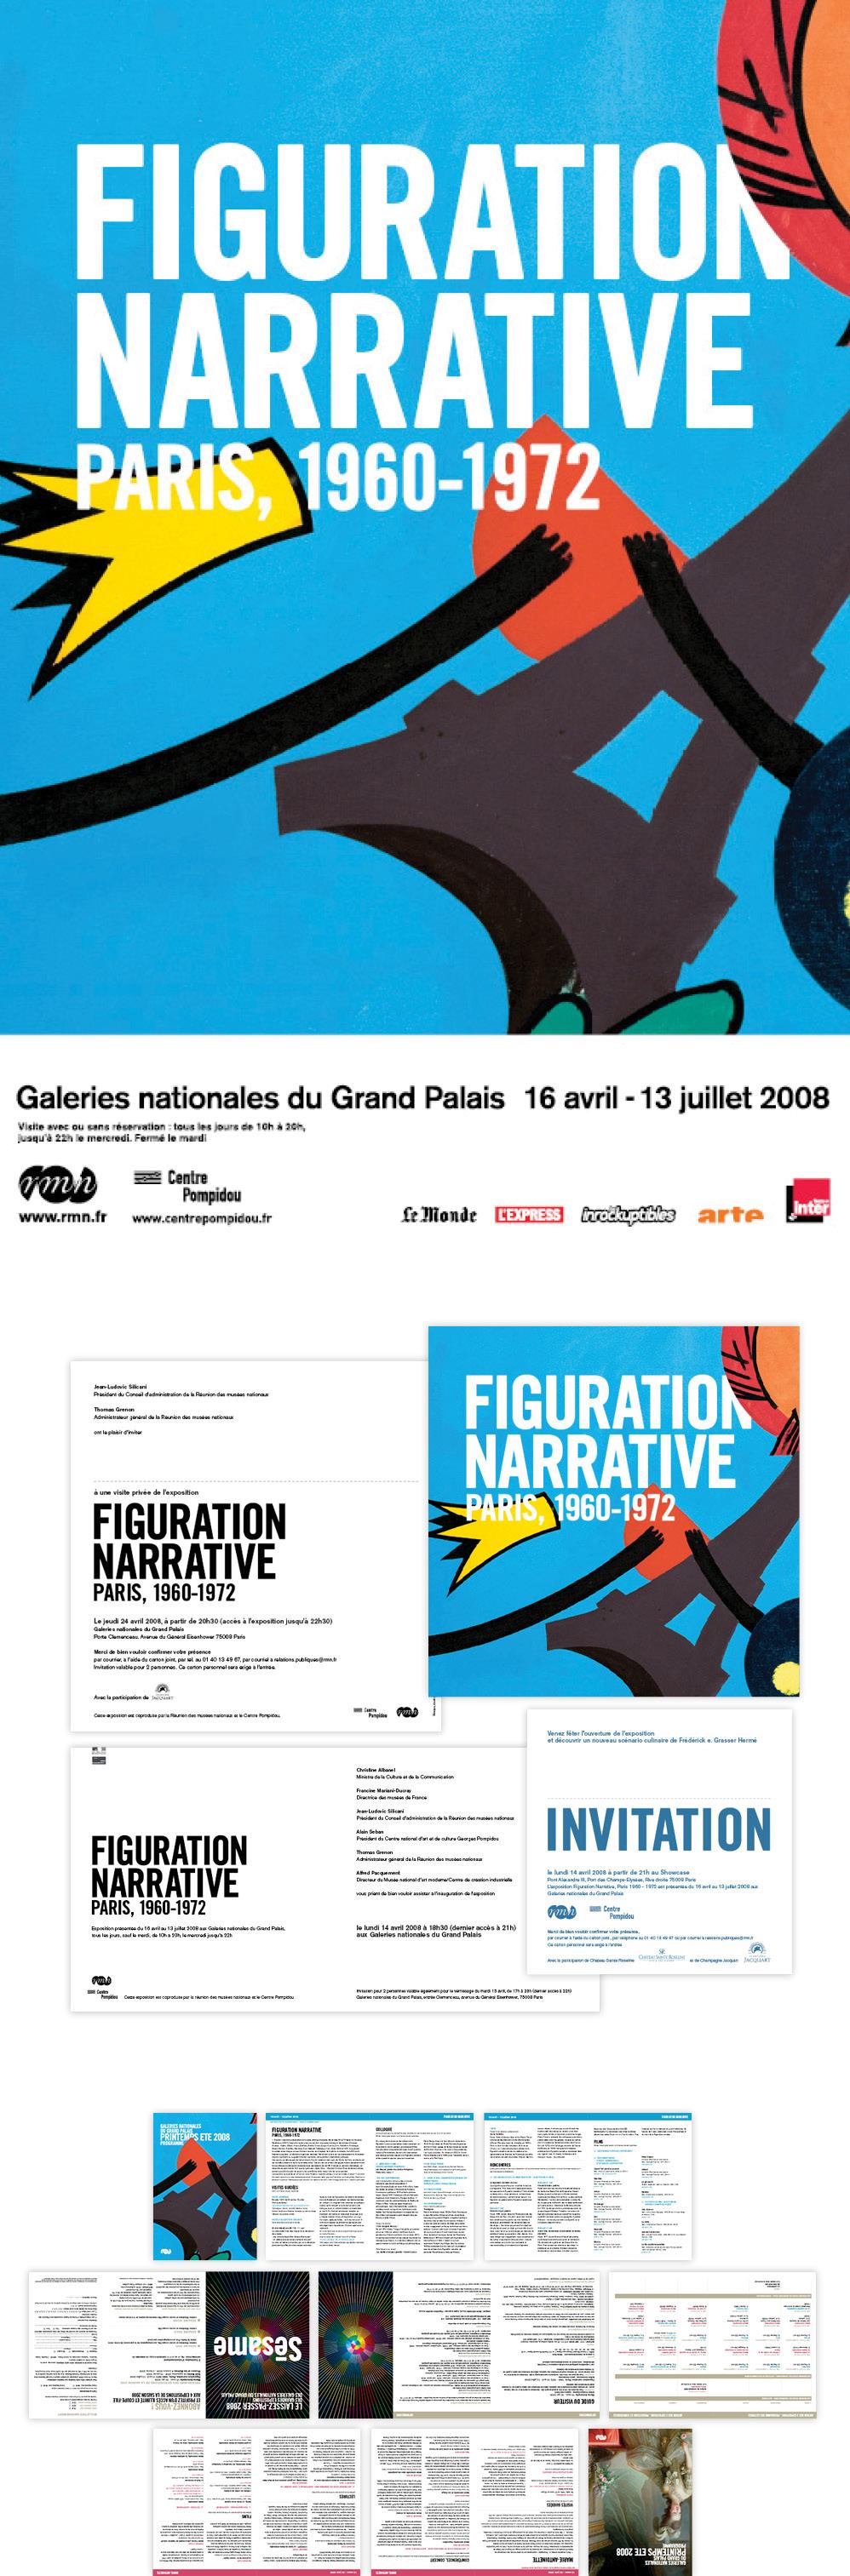 Figuration narrative dame loky nora moureau for Figuration narrative